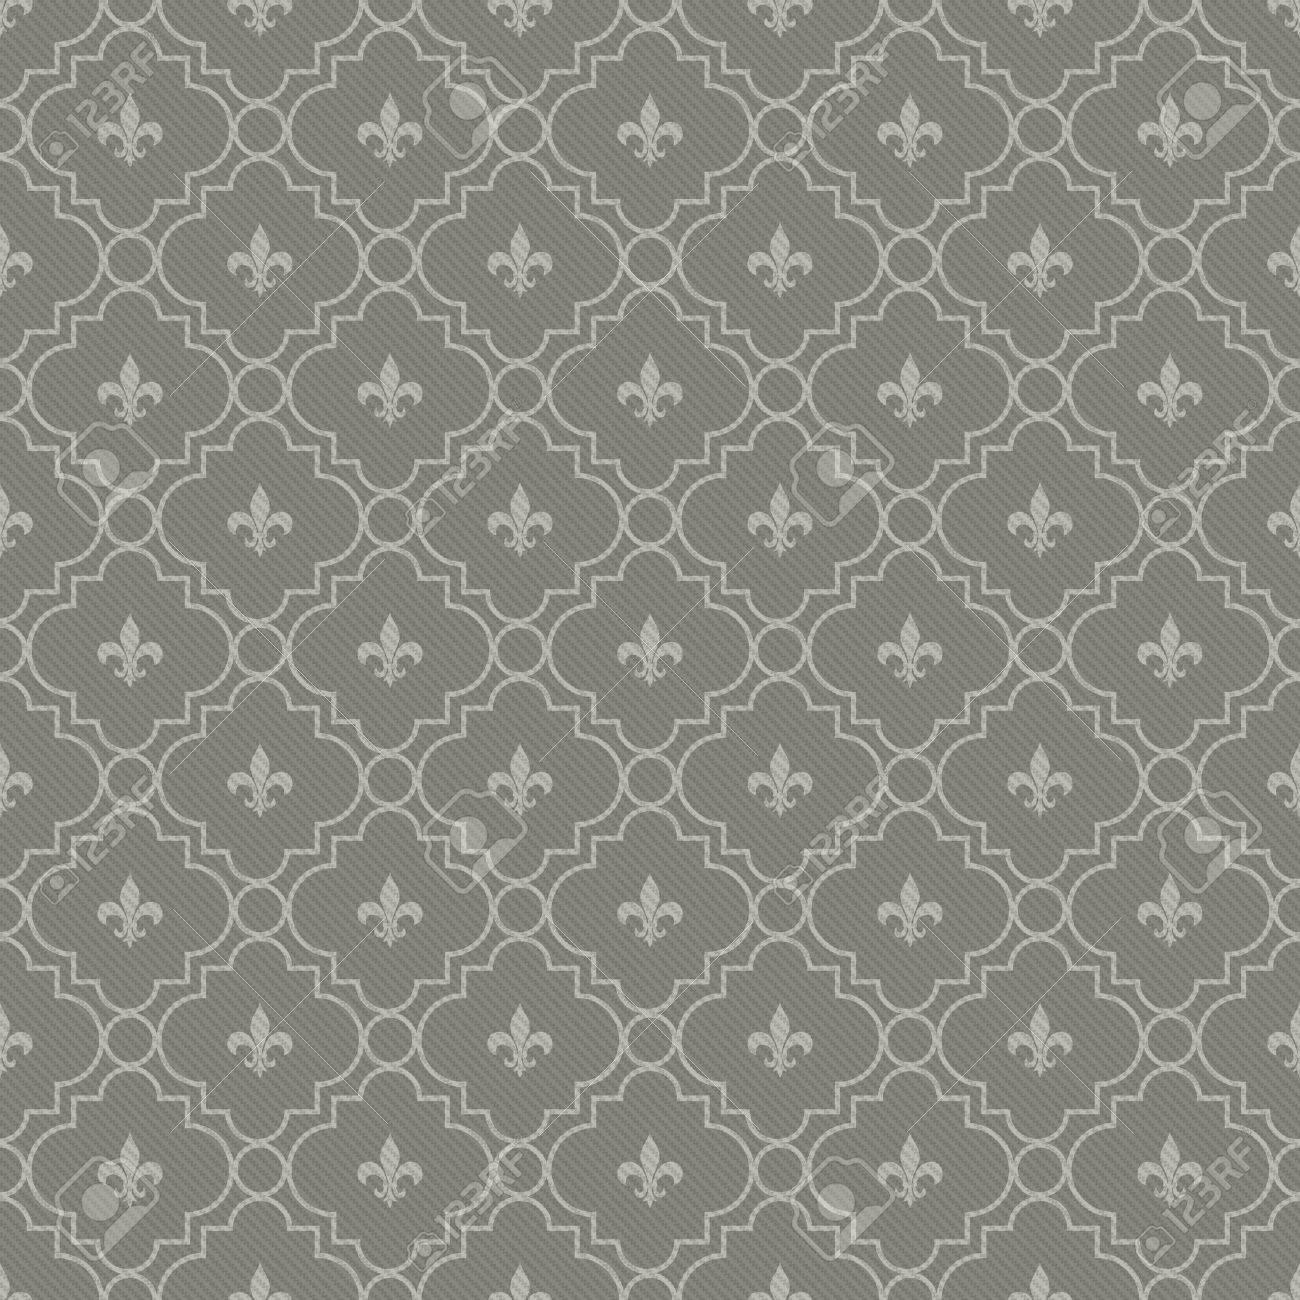 white and dark gray fleur de lis pattern textured fabric background